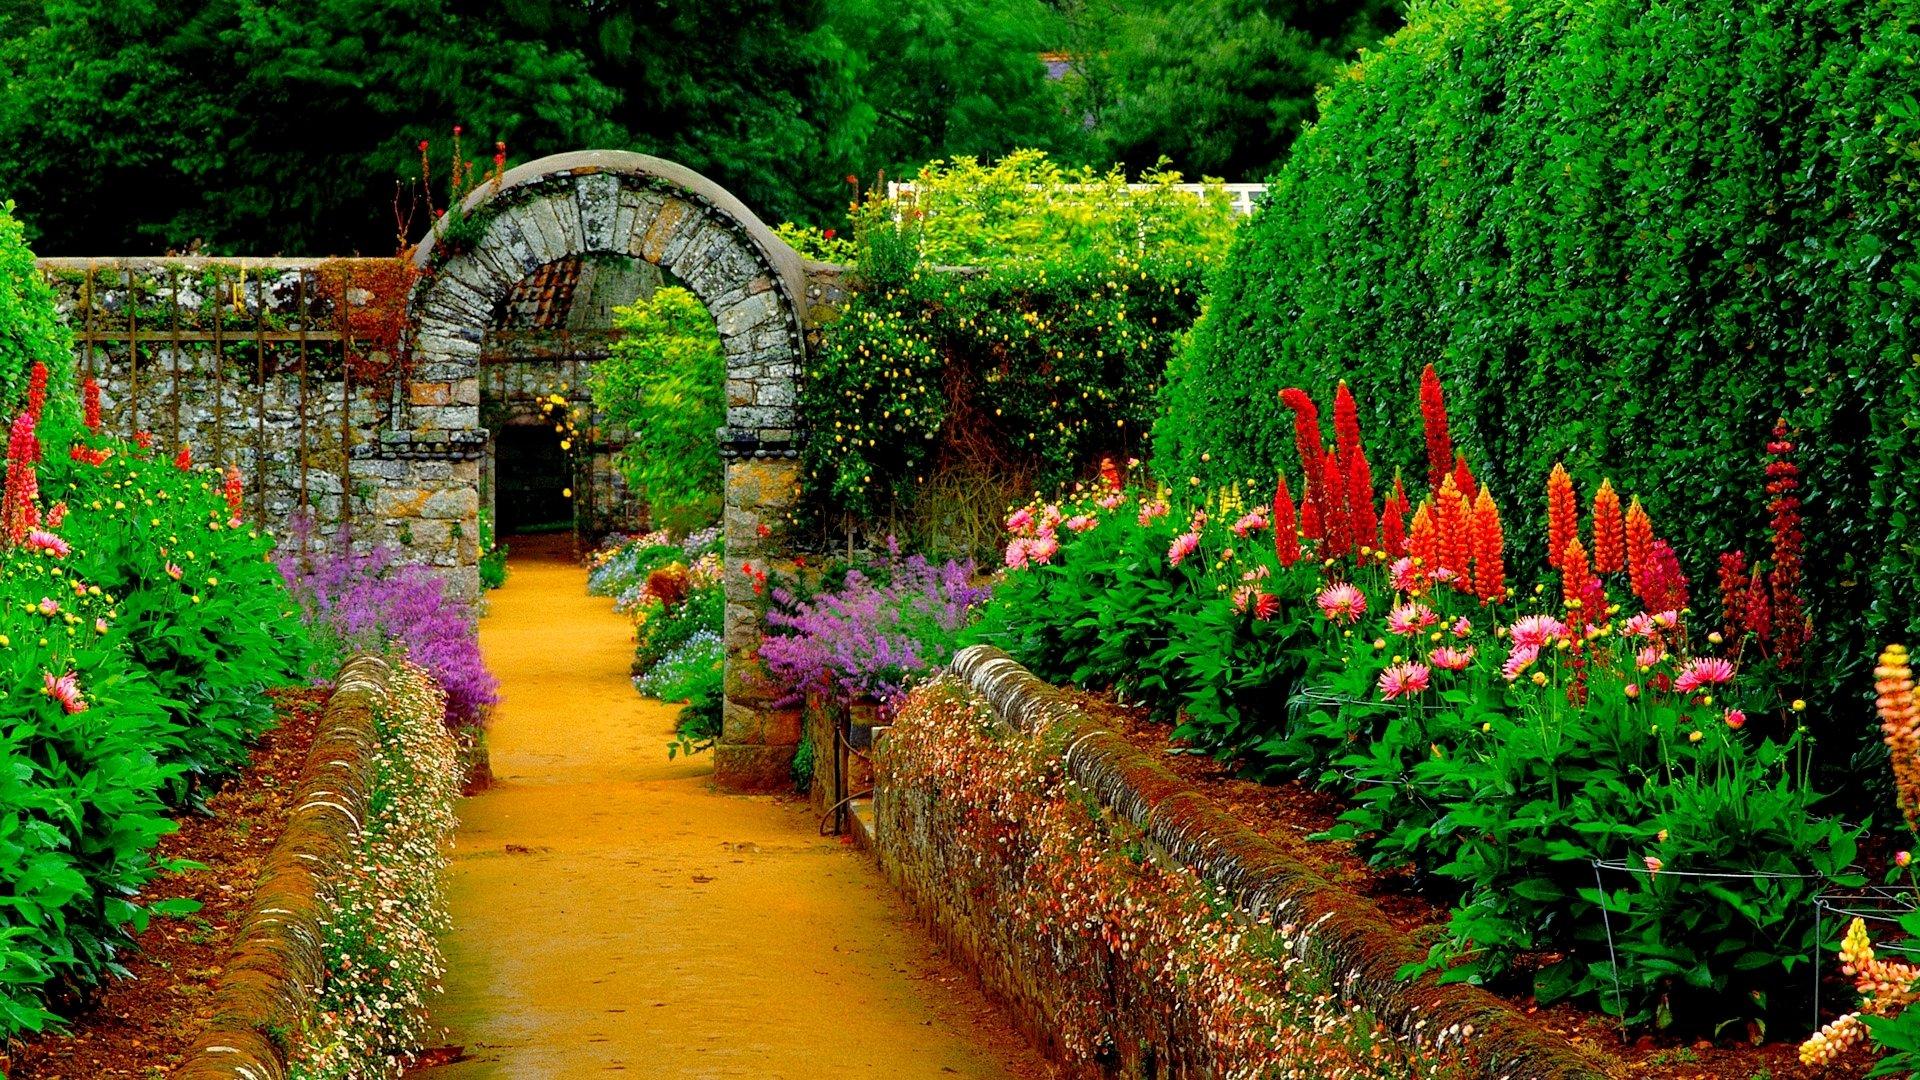 Garden Hd Wallpaper Background Image 1920x1080 Id 948550